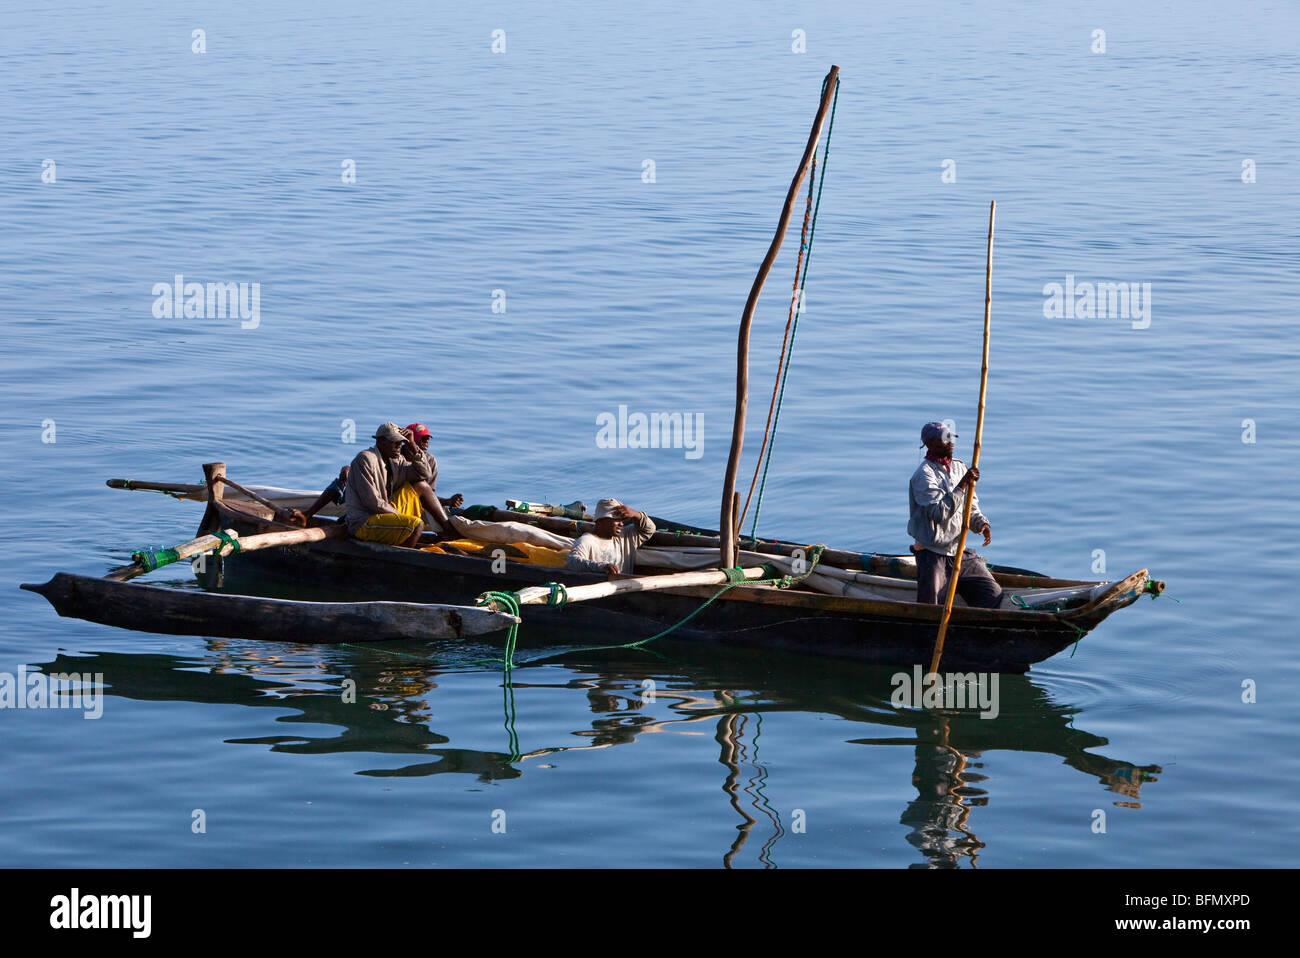 Tanzania, Zanzibar. In the morning, fishermen pole an outrigger canoe back to Zanzibars dhow harbour after fishing - Stock Image